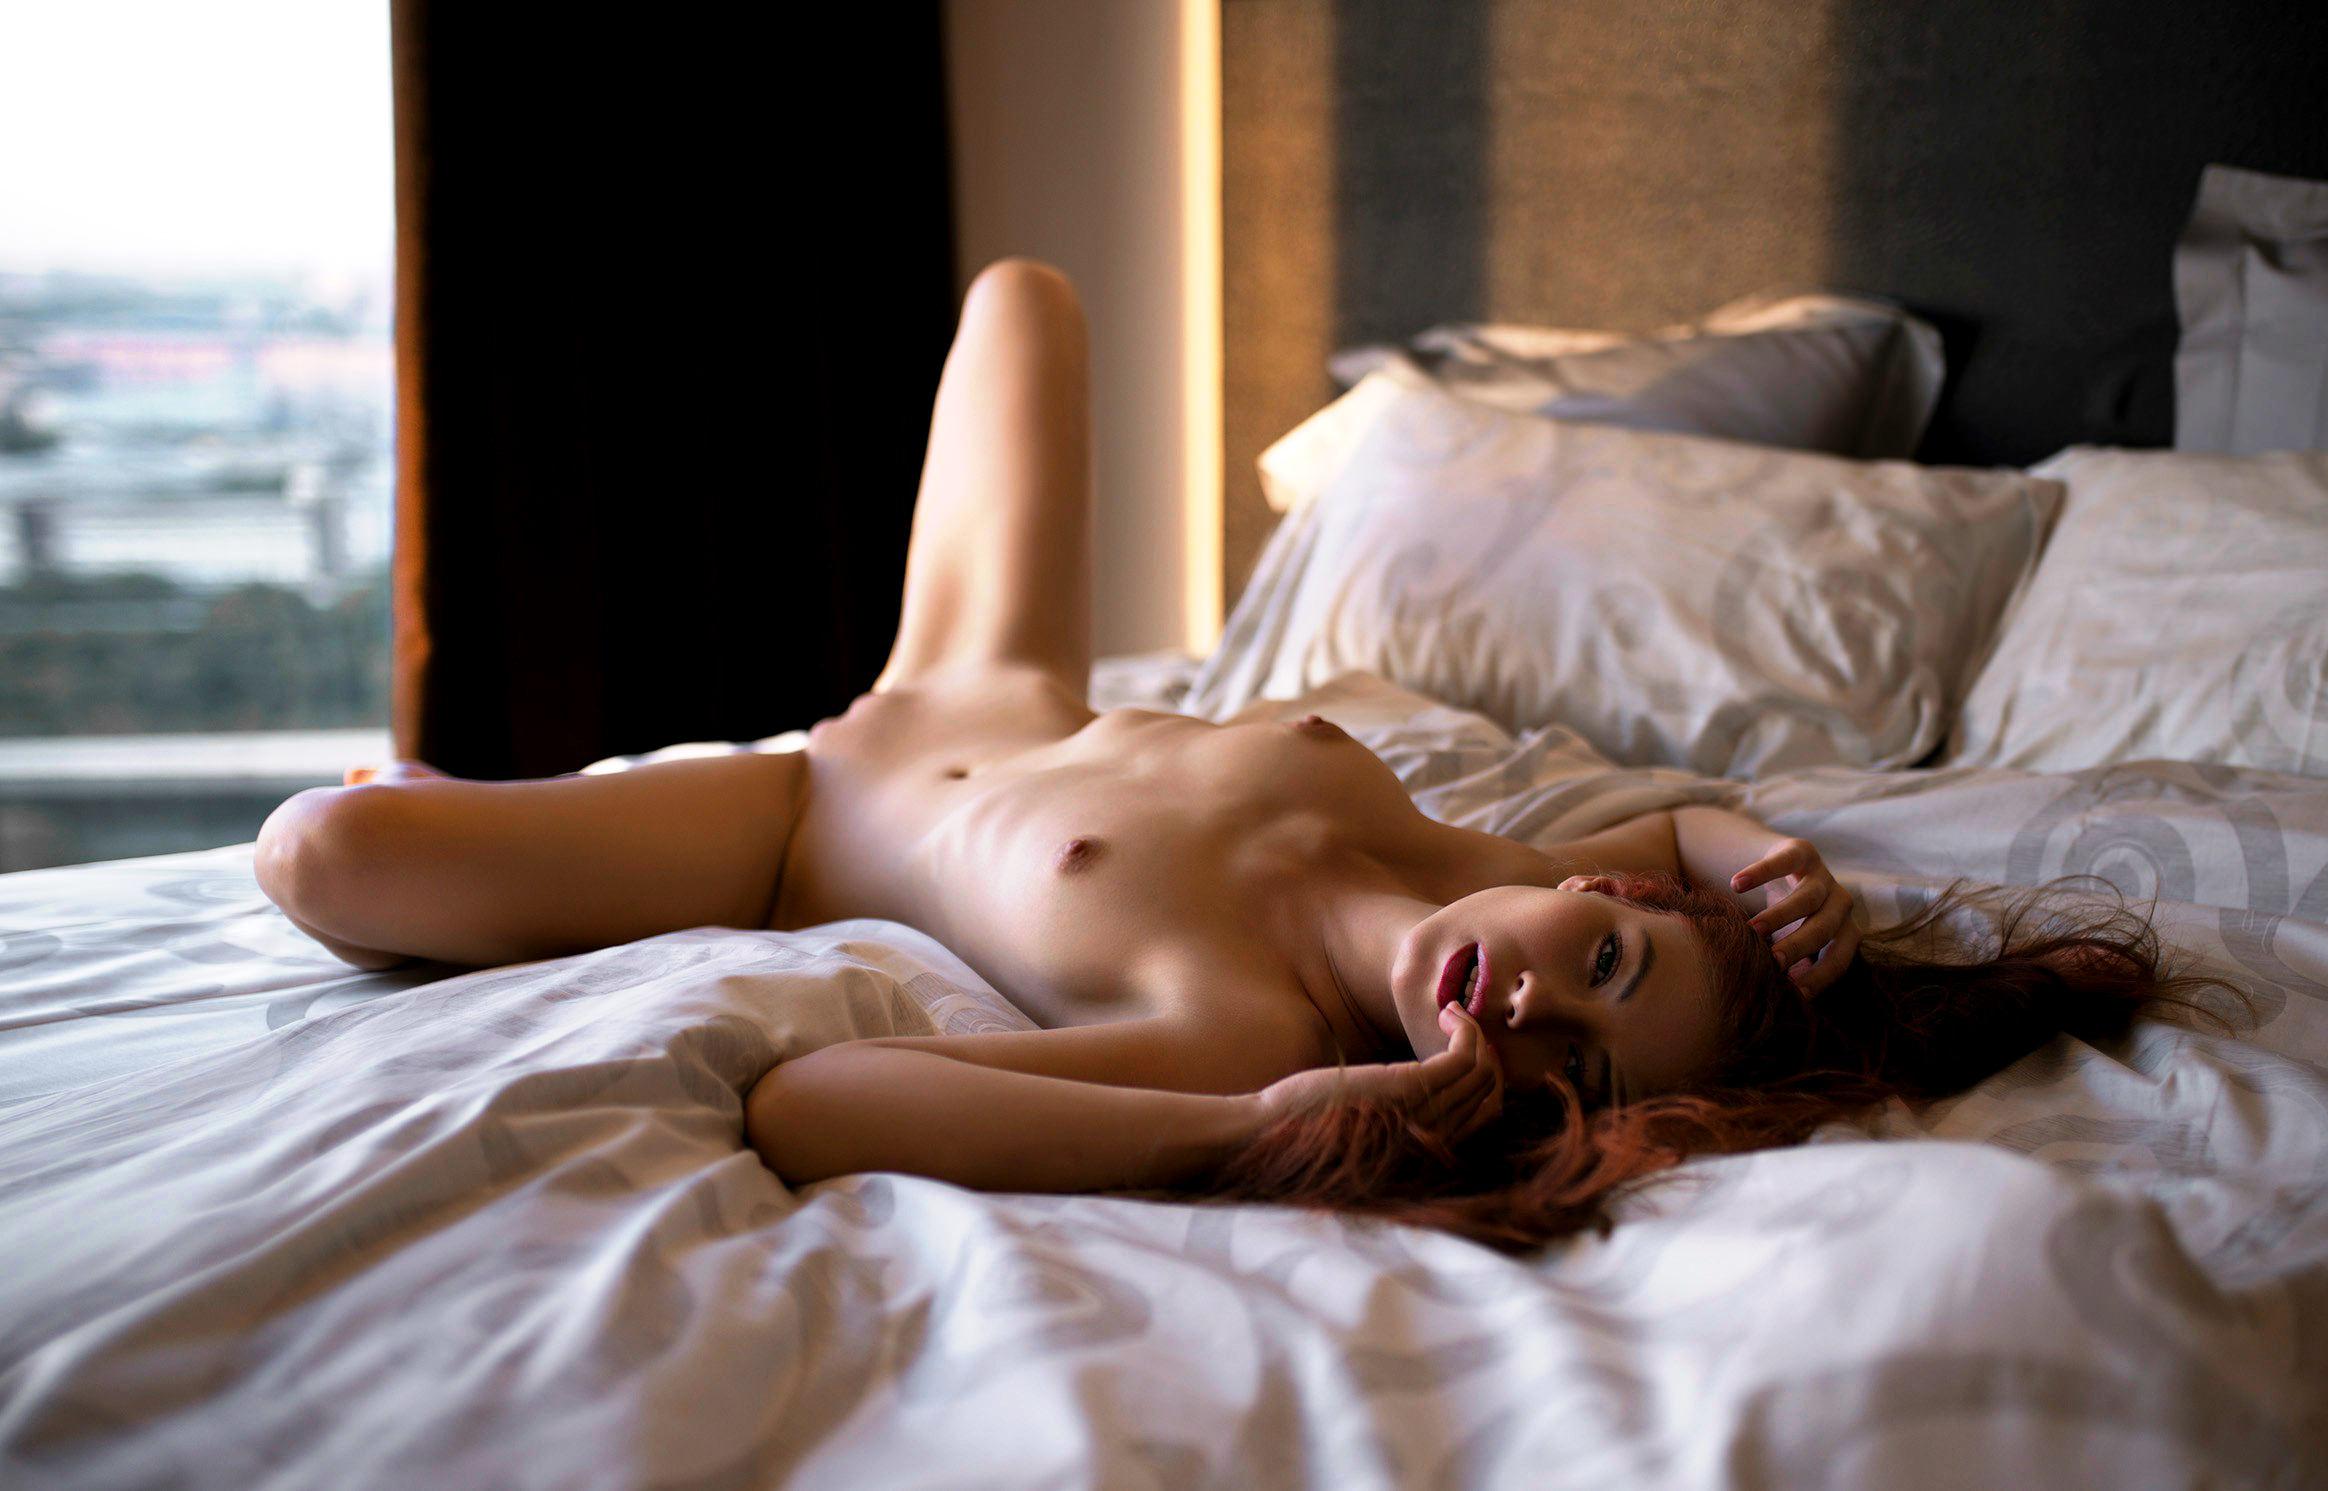 Neoaphrodite nude tumblr big tits goddess